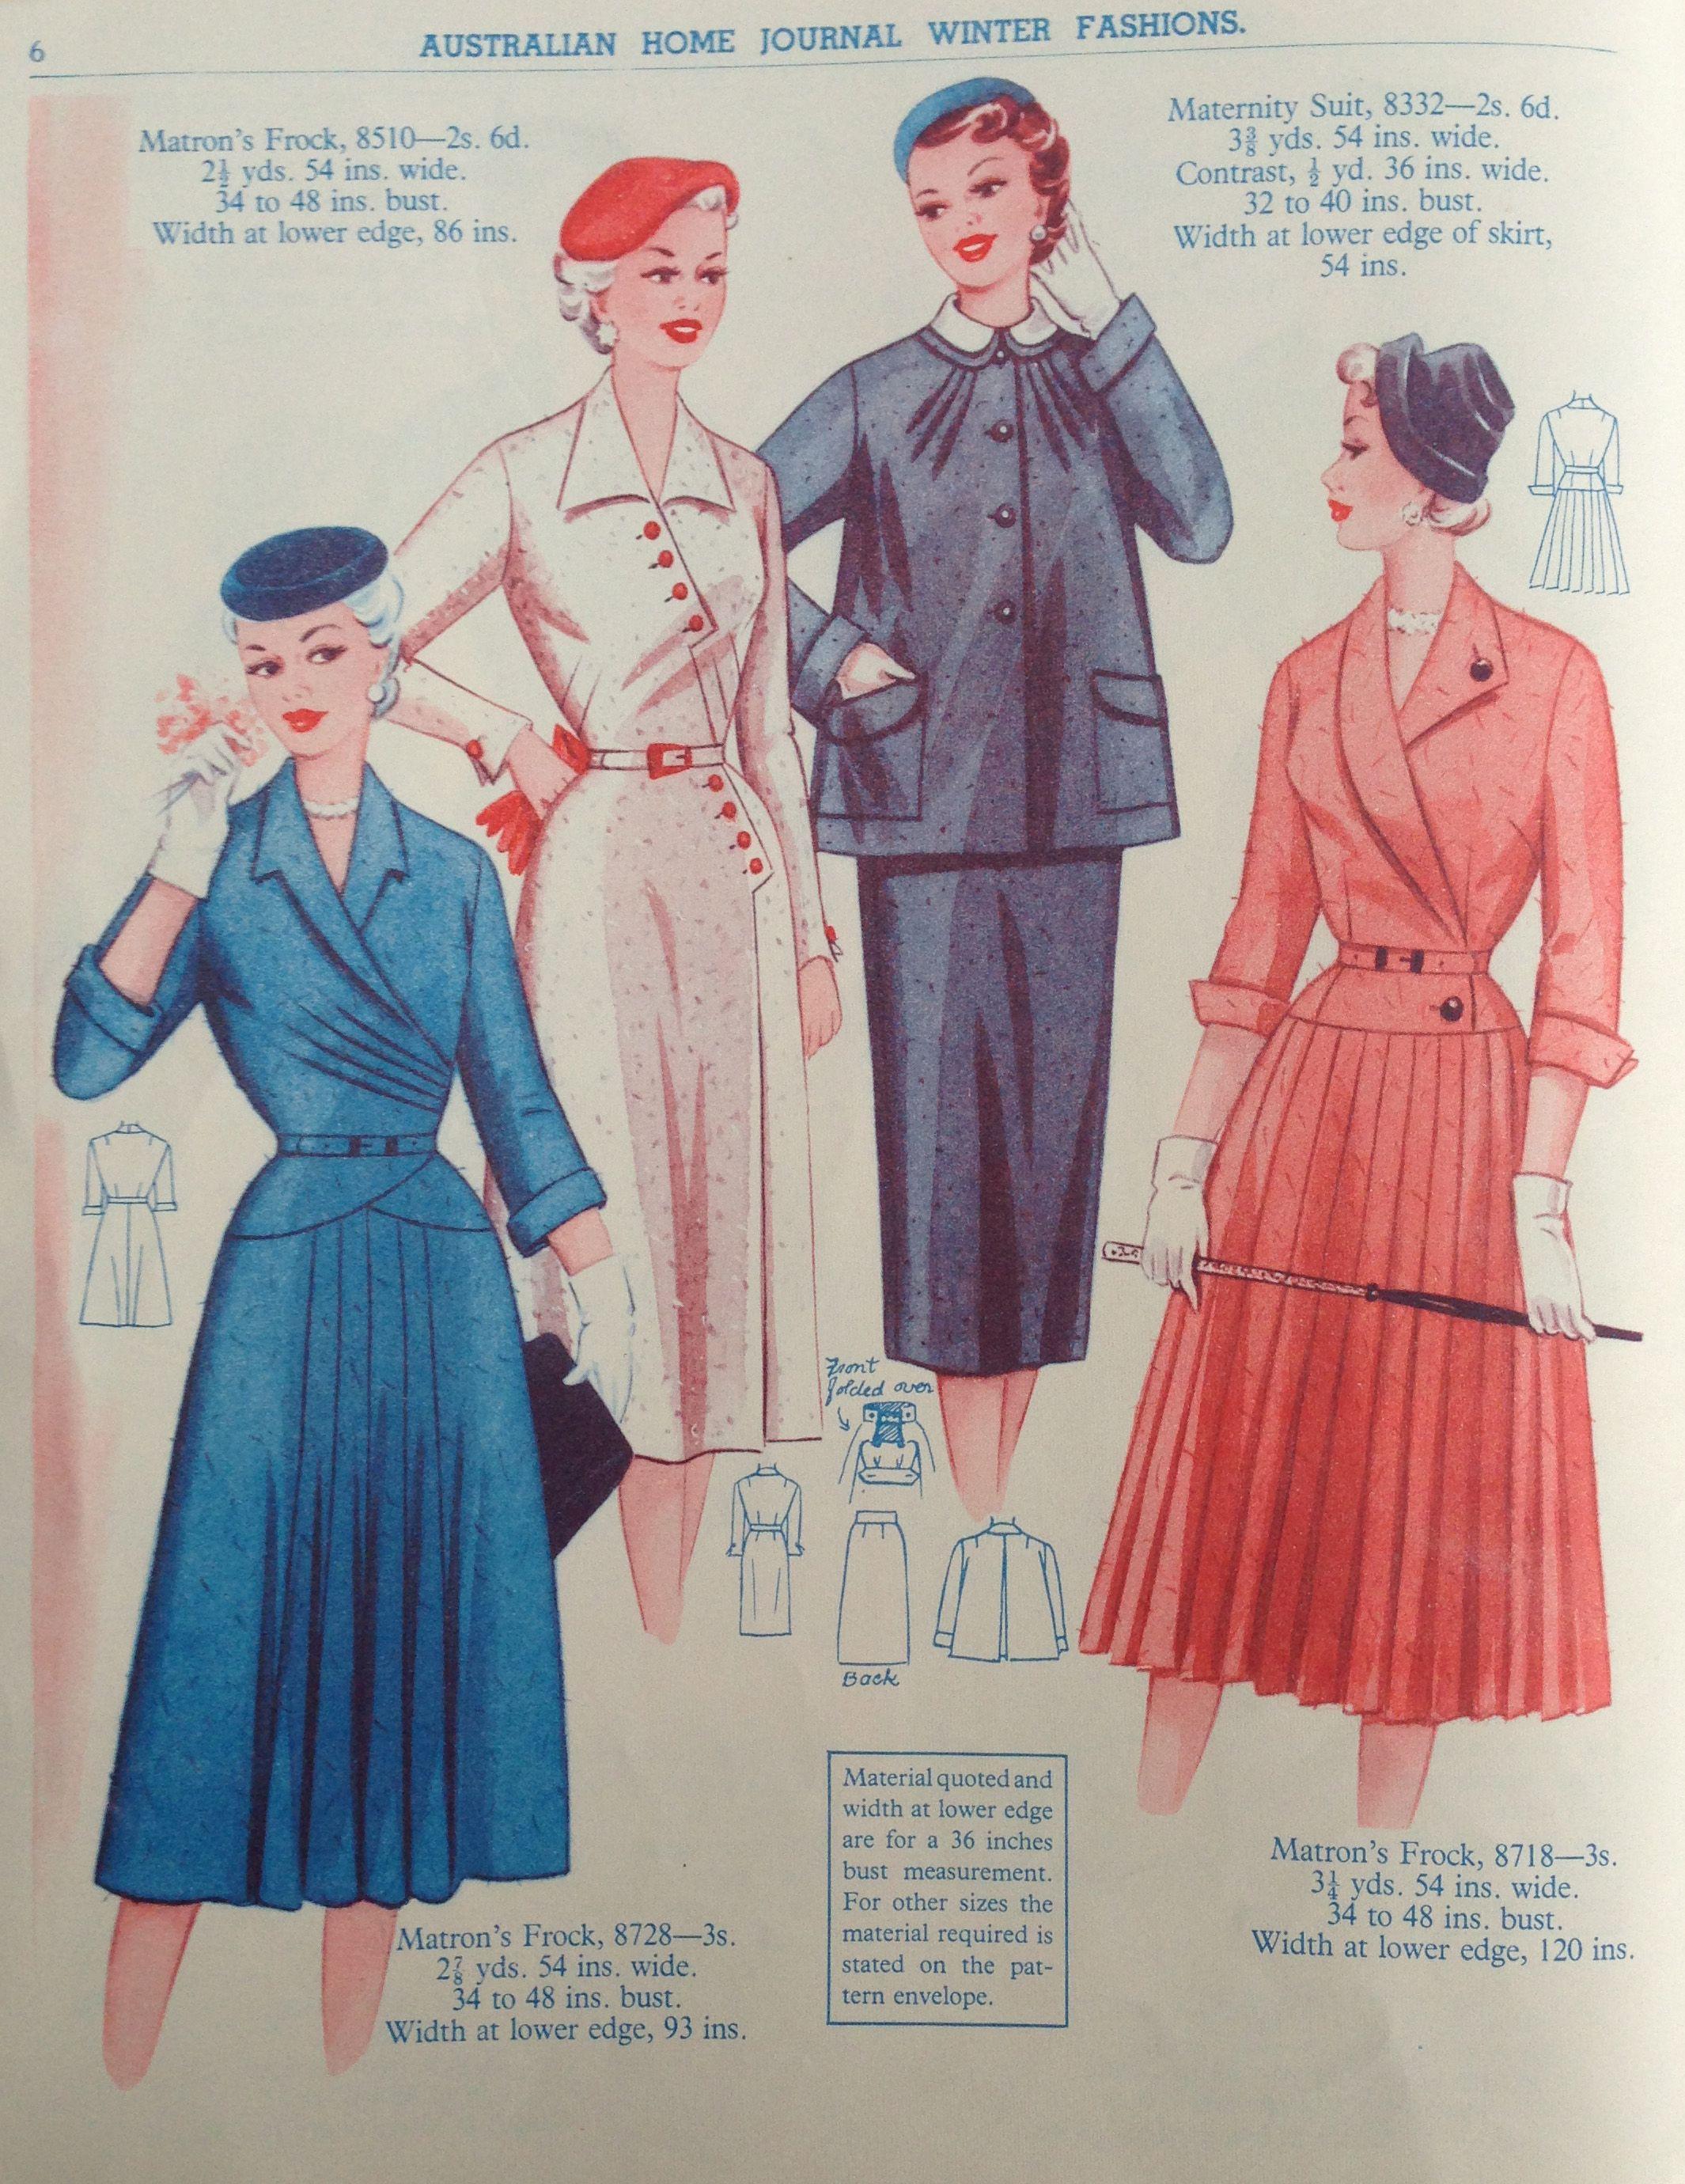 Australian Home Journal - 50\'s fashion | Hats, headwear and fashion ...